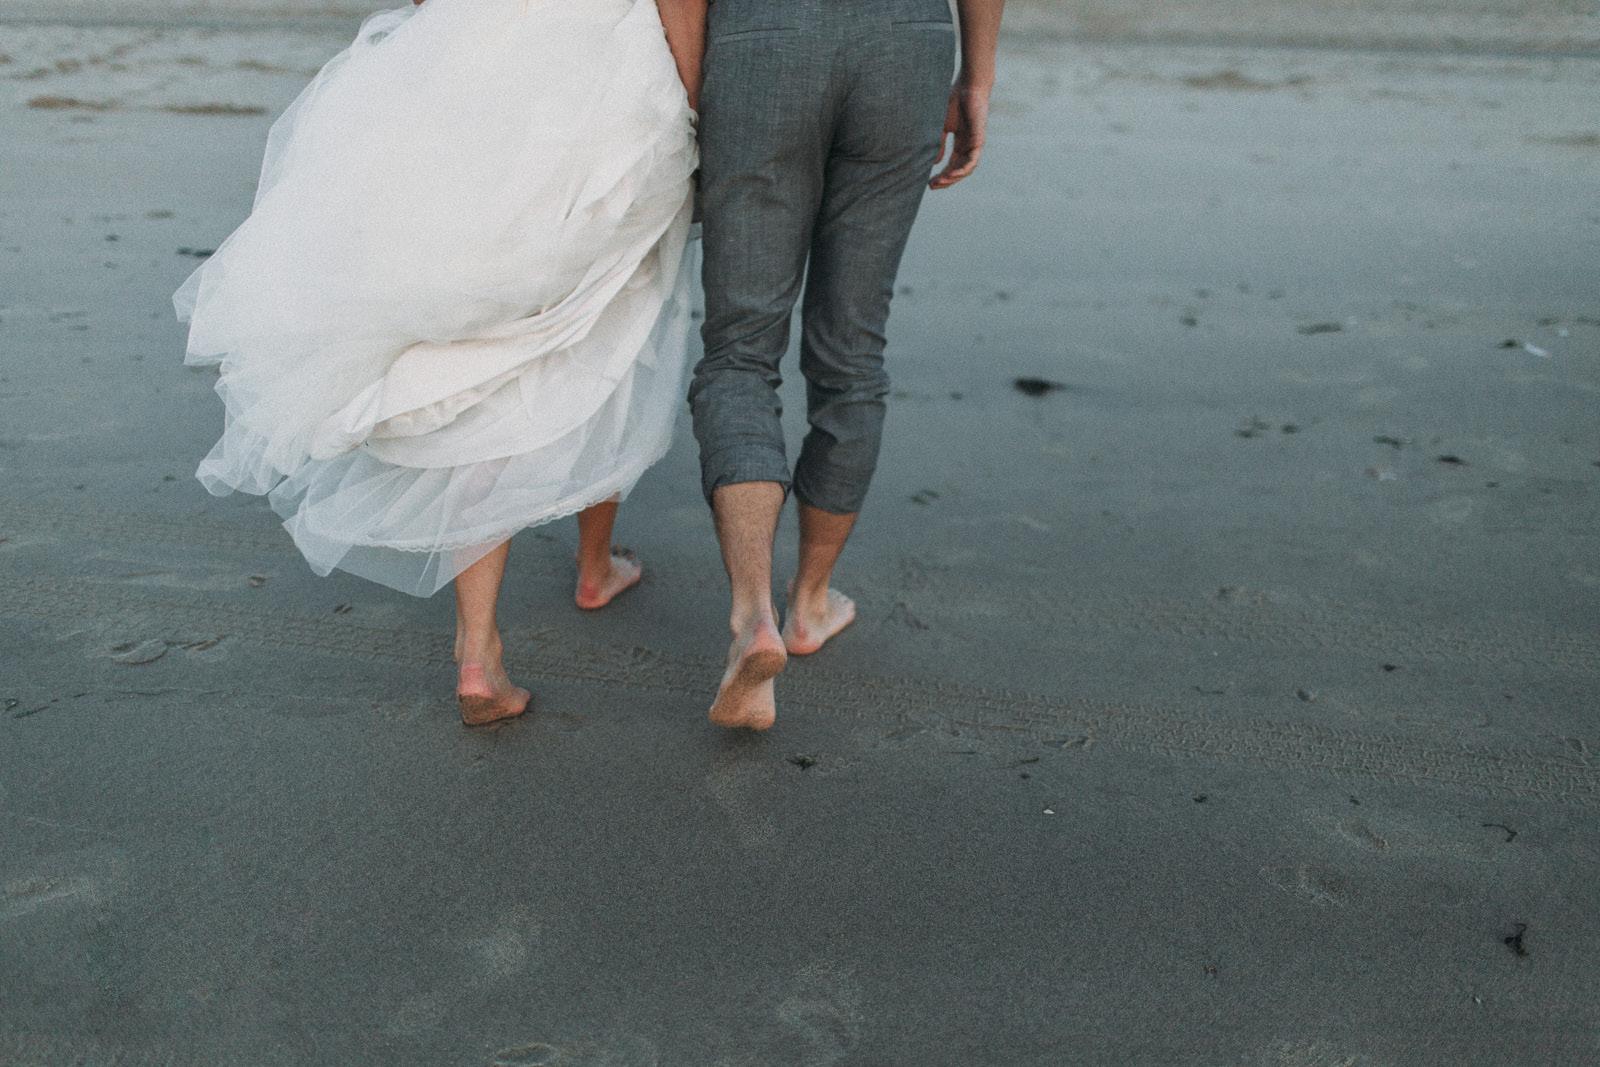 Evabloem_trouwen-sint-joris-doele_strandpaviljoen-zuid-84.jpg